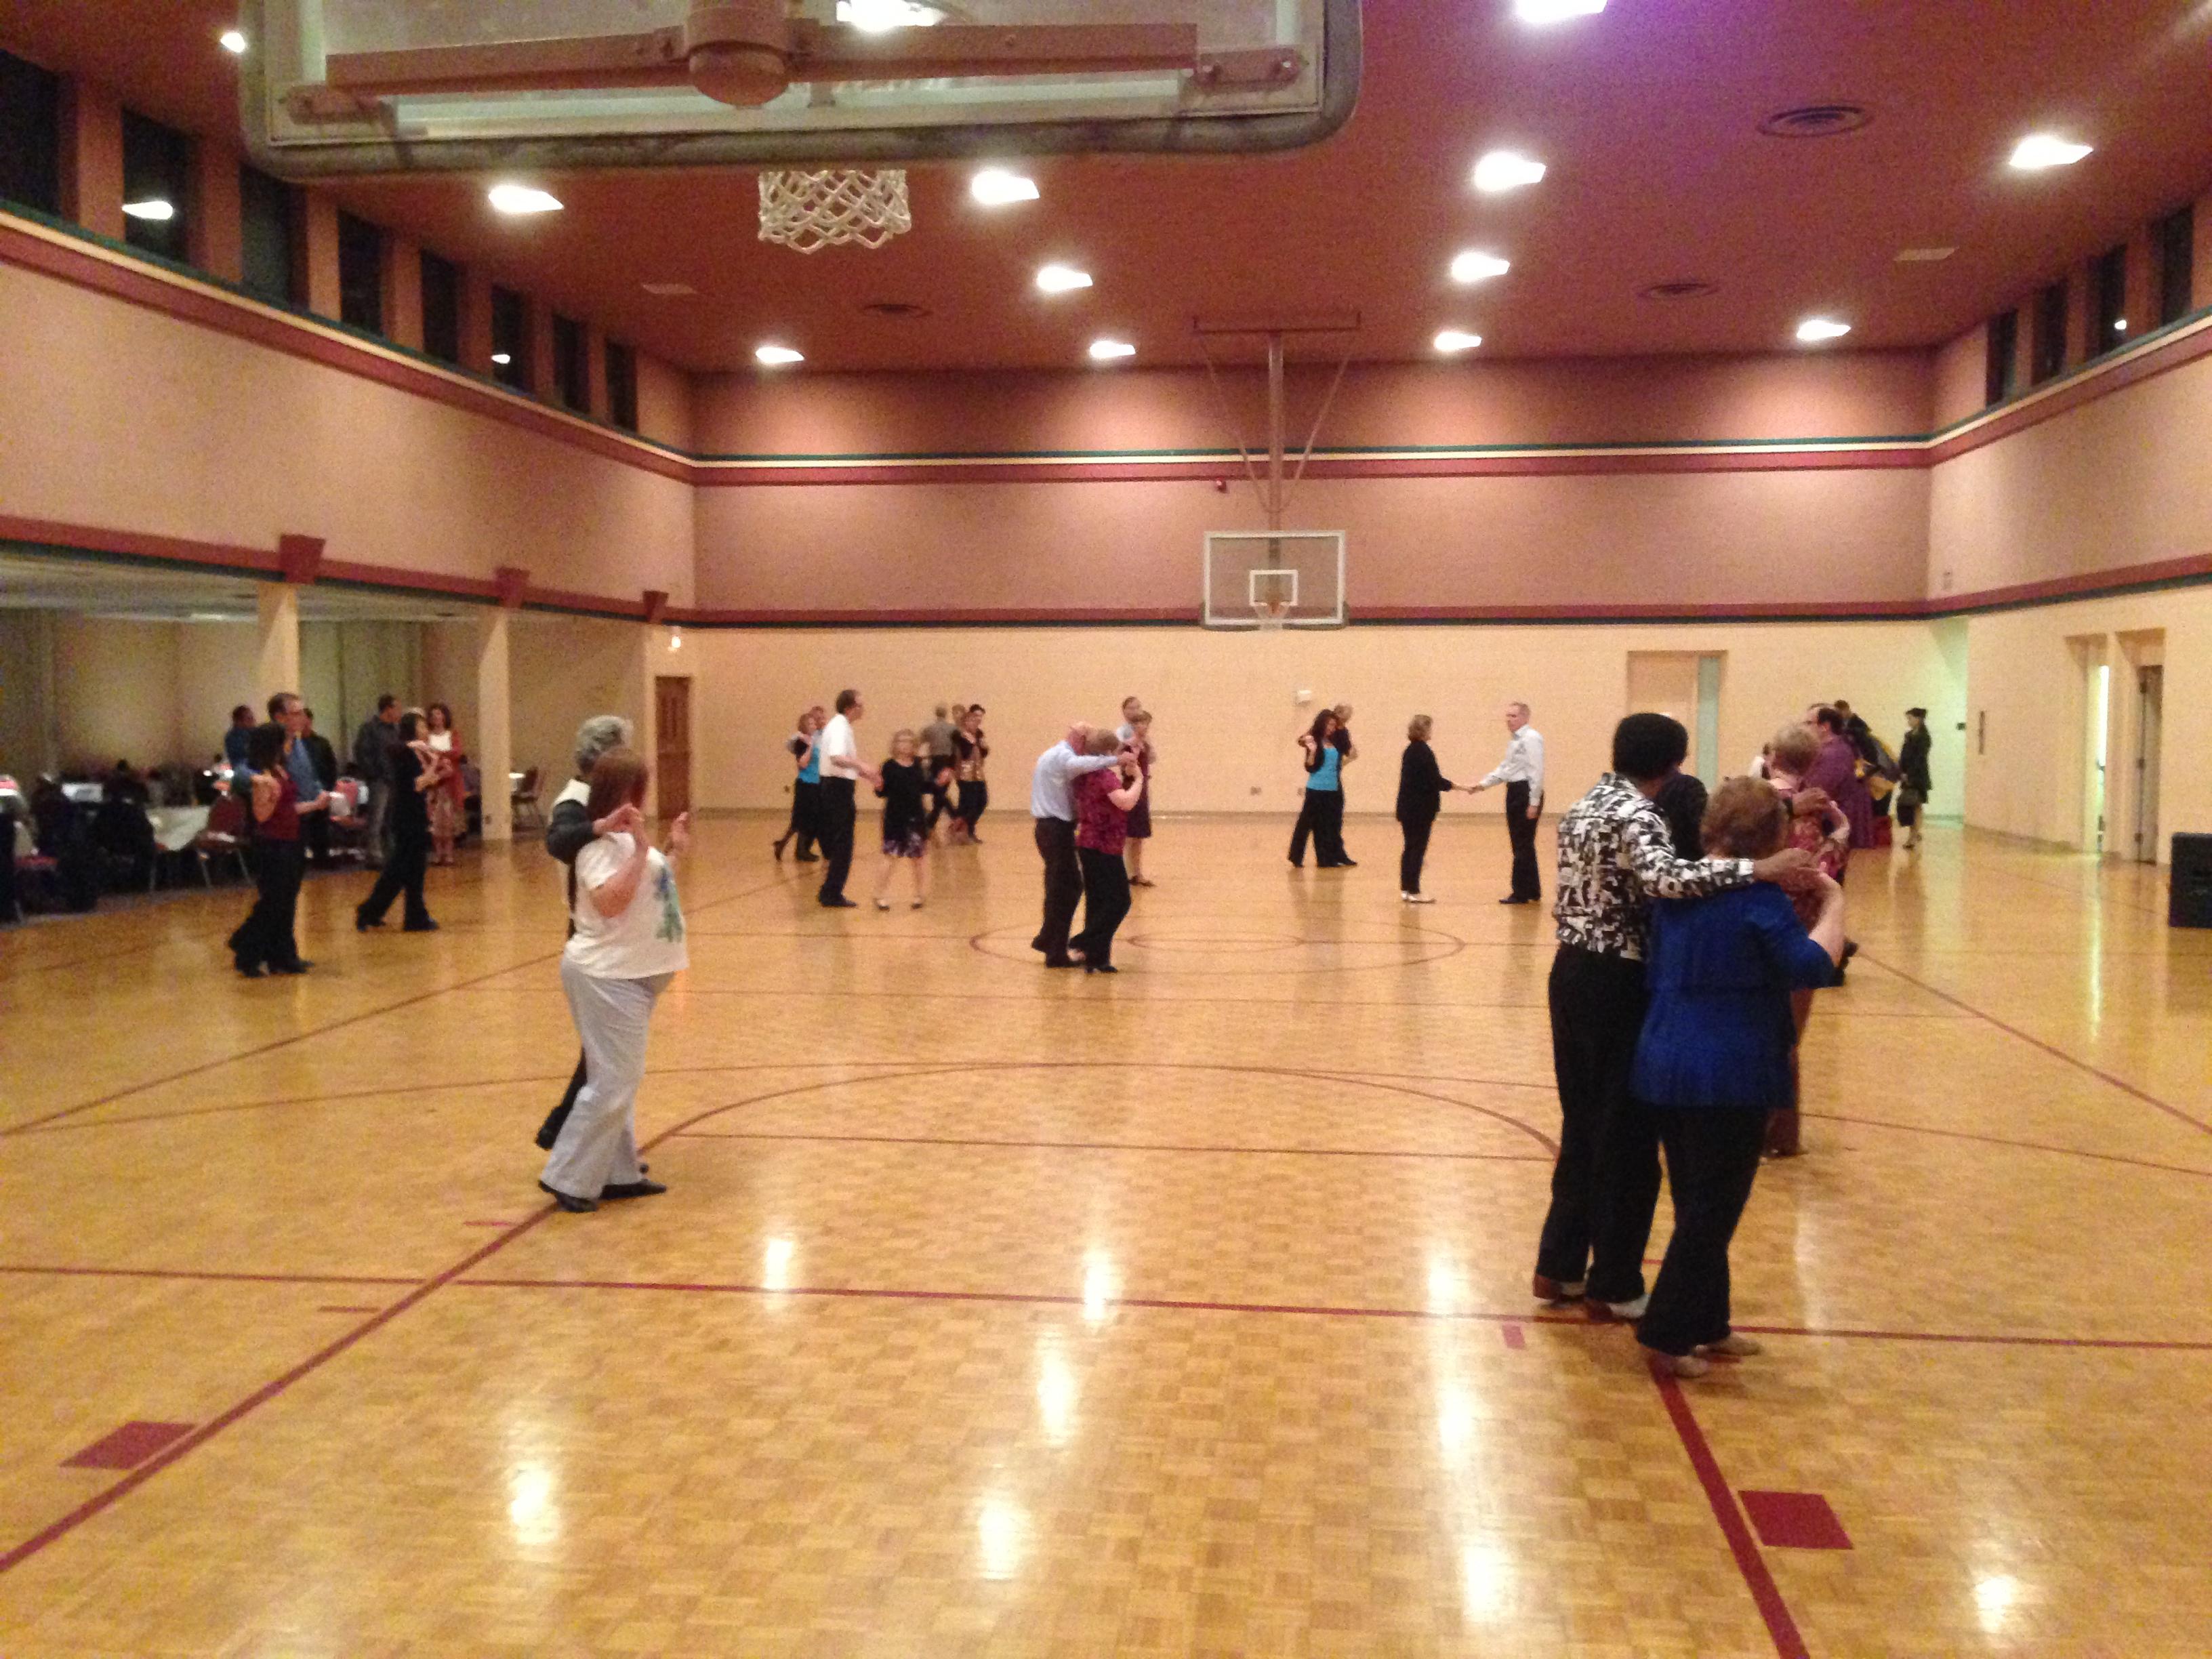 Nov 30th dance at the GOC